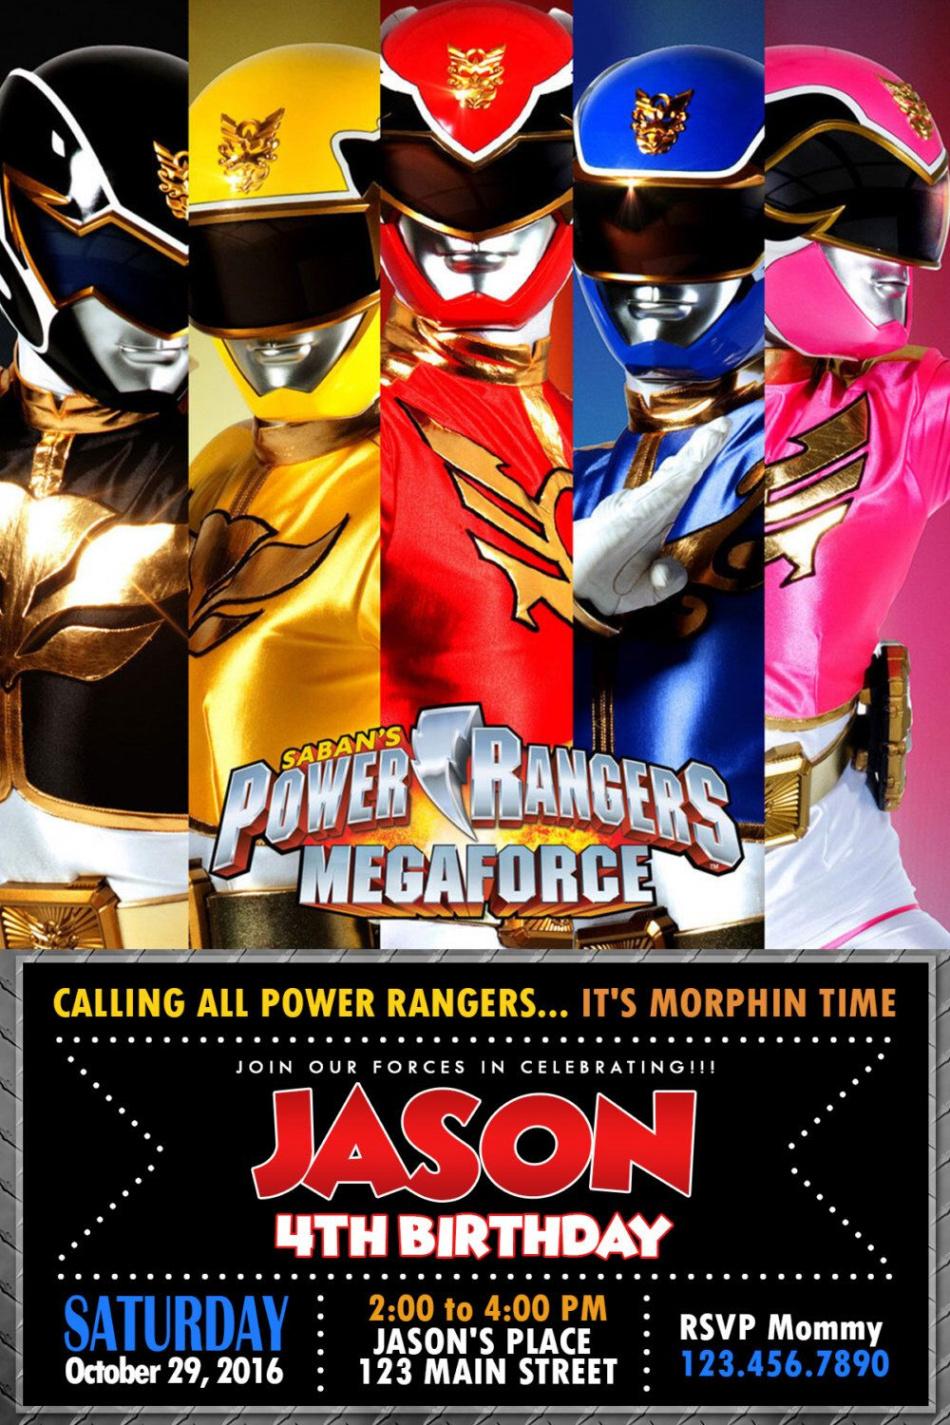 Luxury Free Printable Power Ranger Birthday Invitations - Free Printable Power Ranger Birthday Invitations